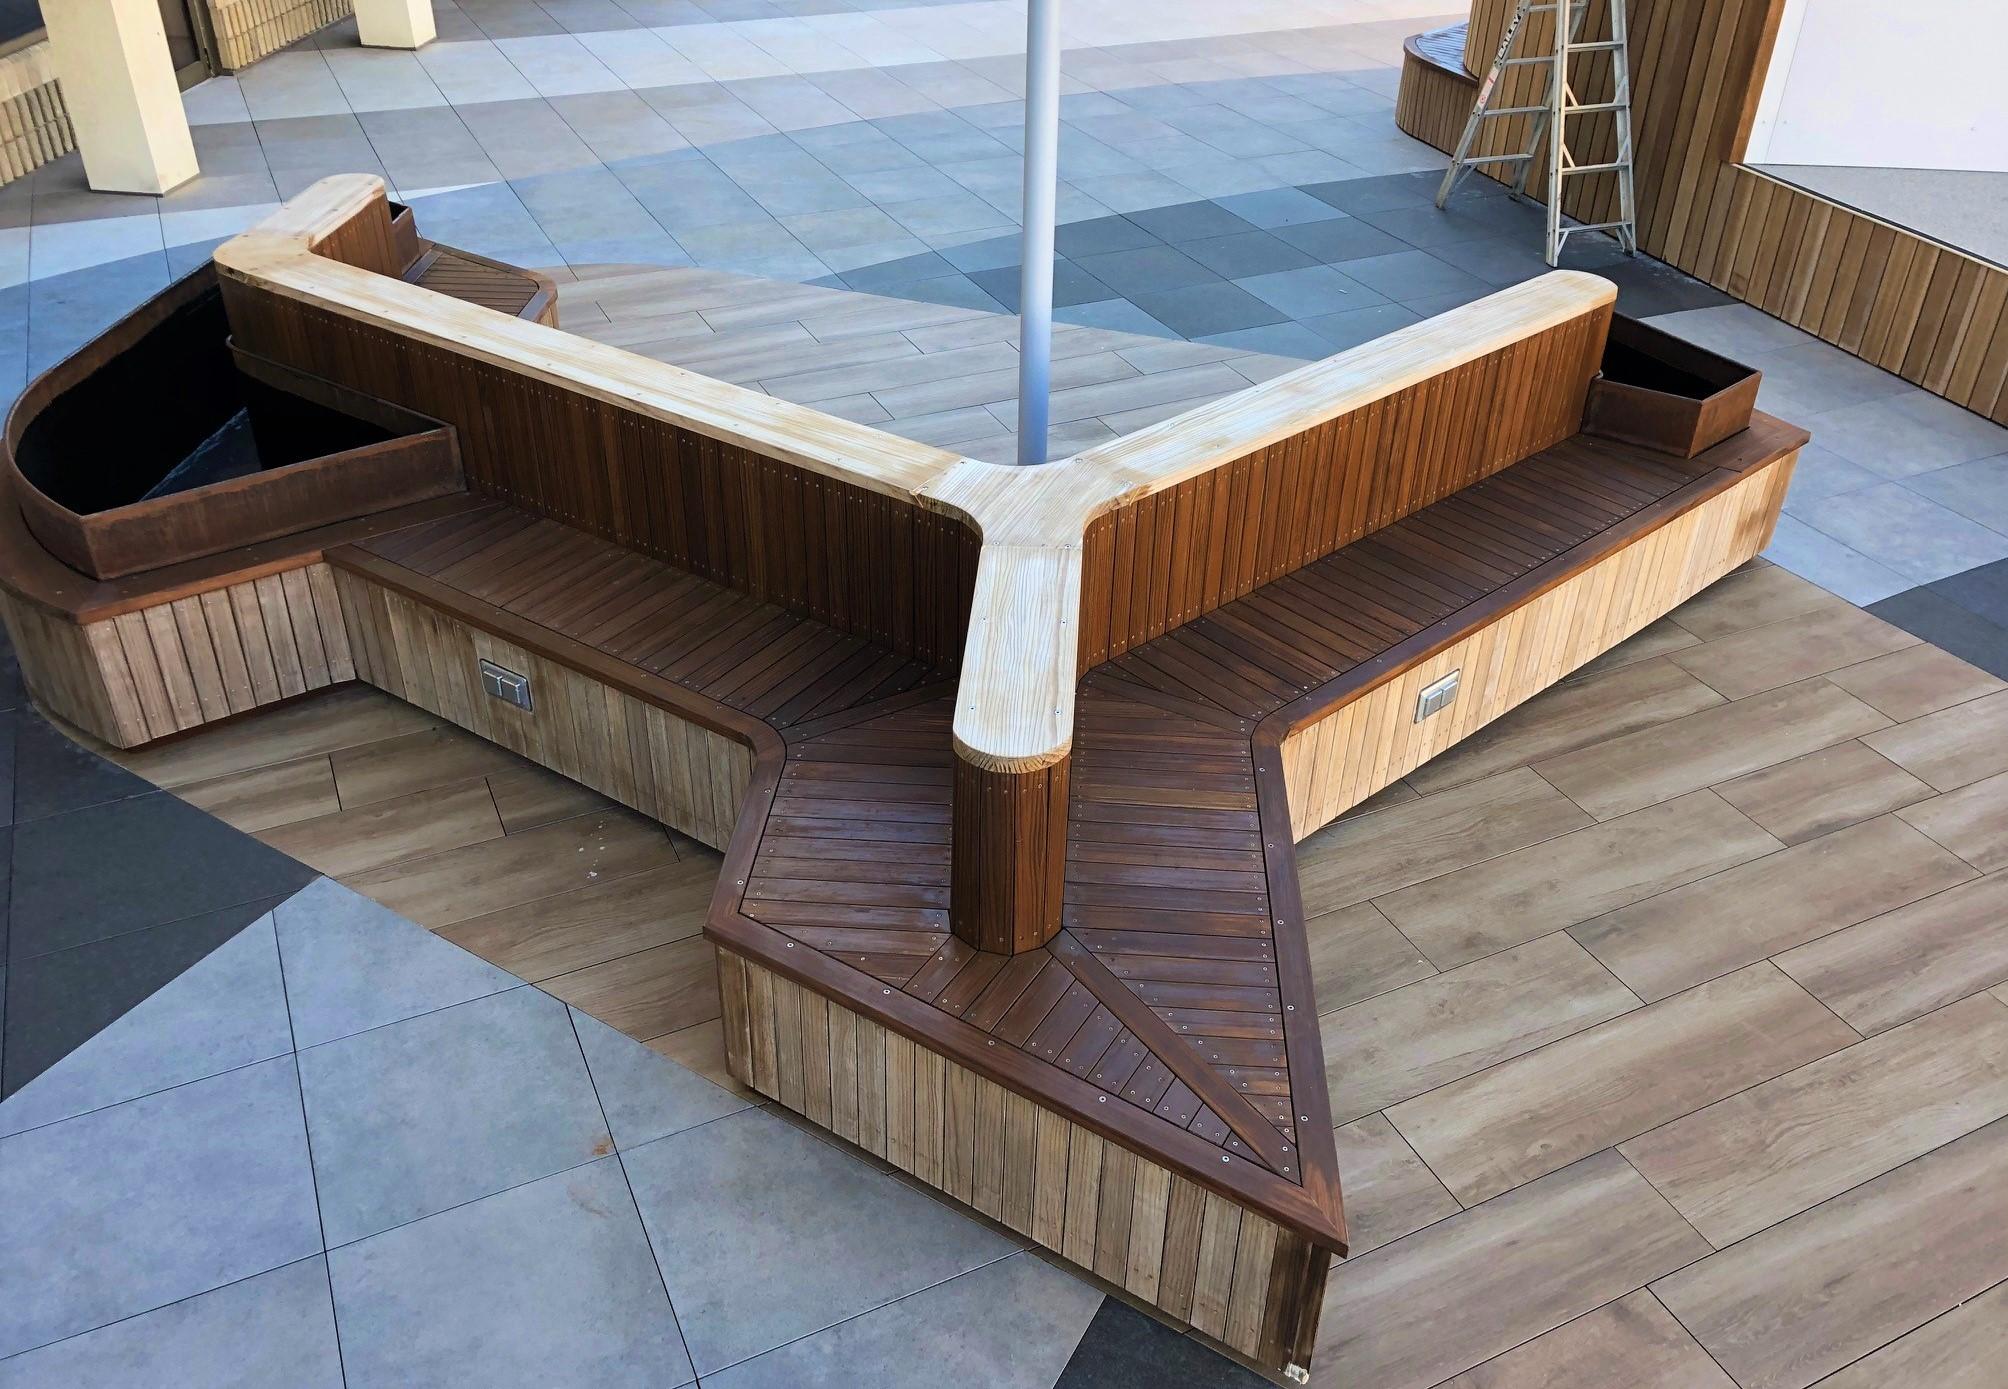 TAFE Rooftop - Seats